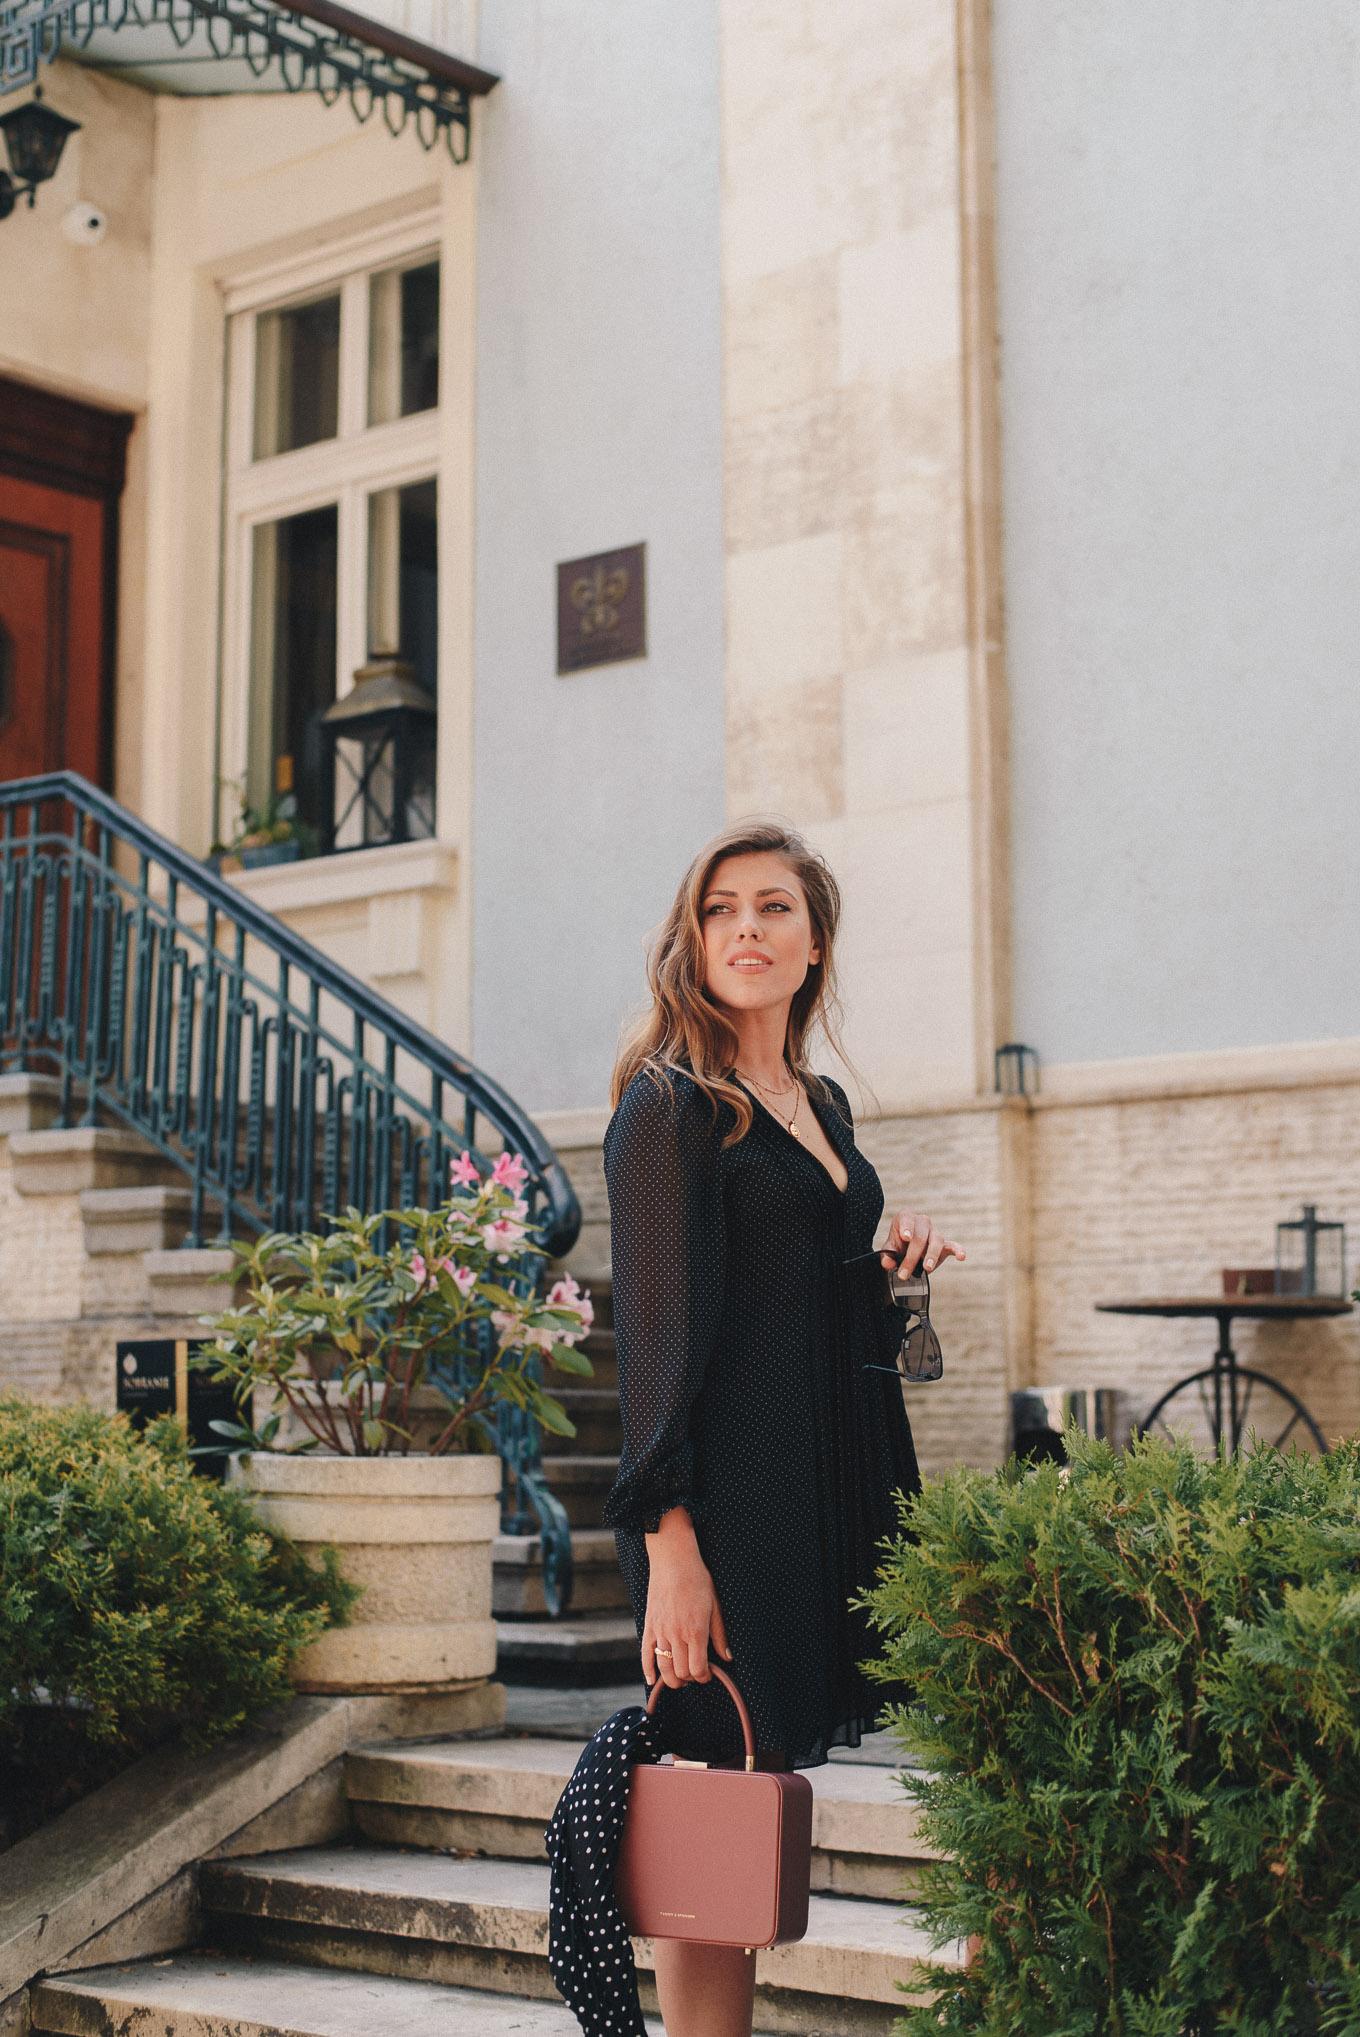 Pretty fashion and style blogger